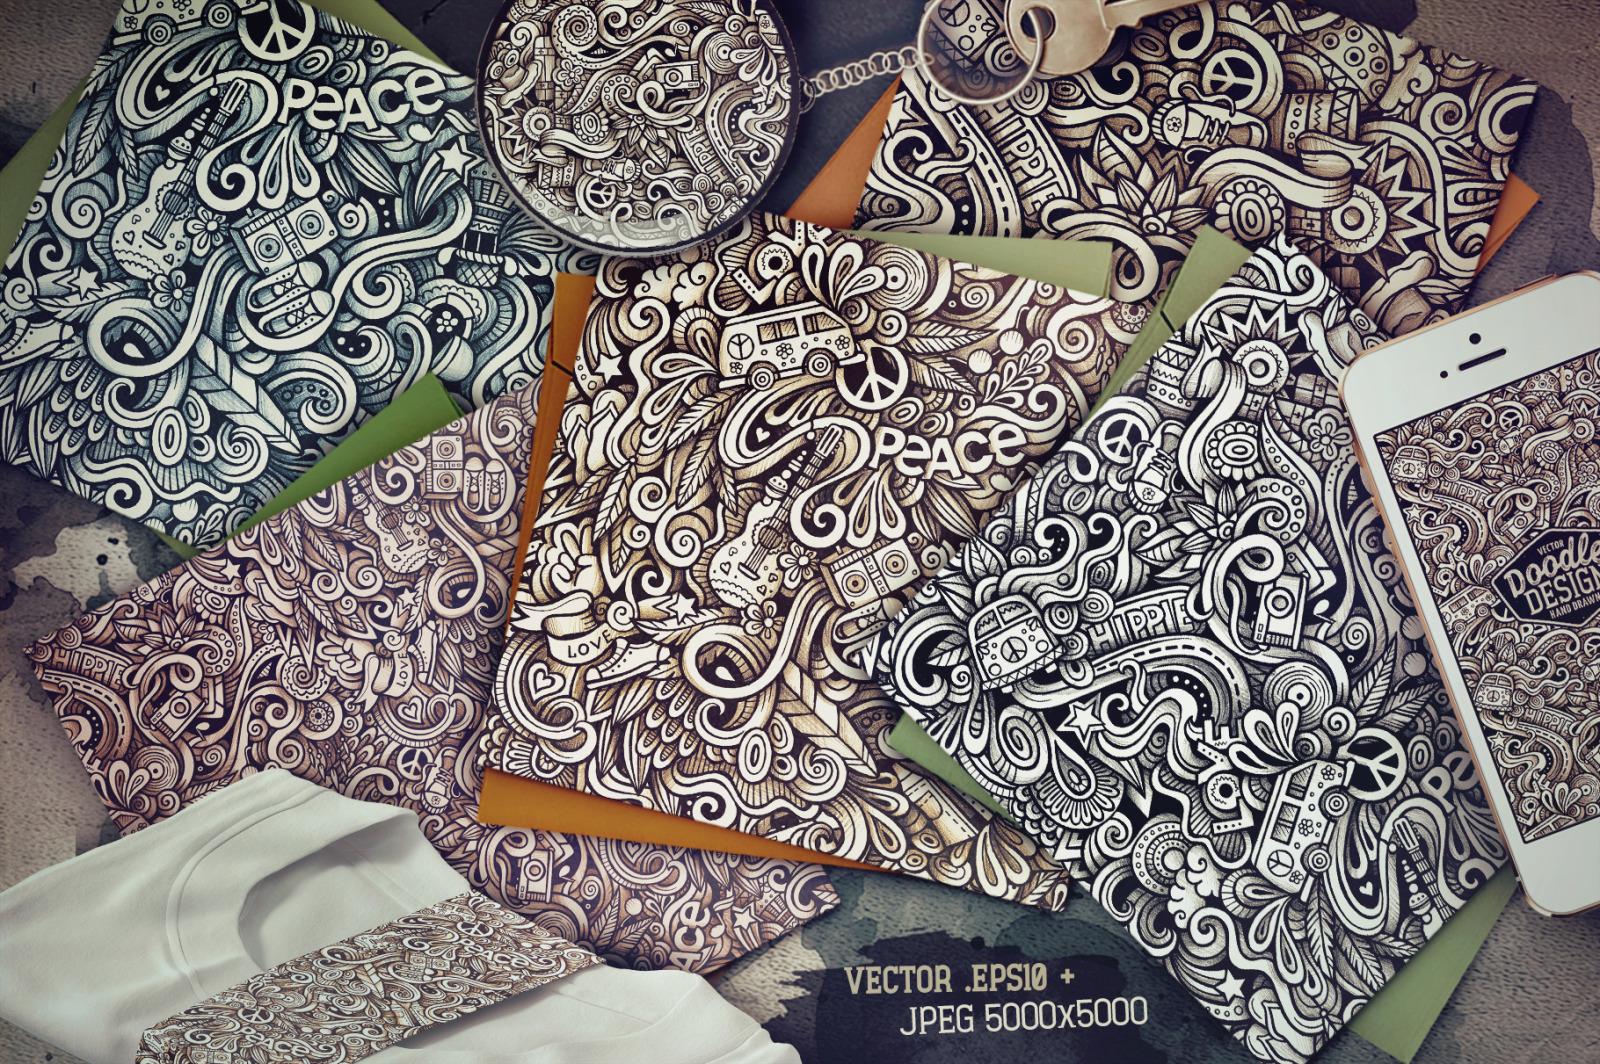 Hippie Graphic Doodle Patterns